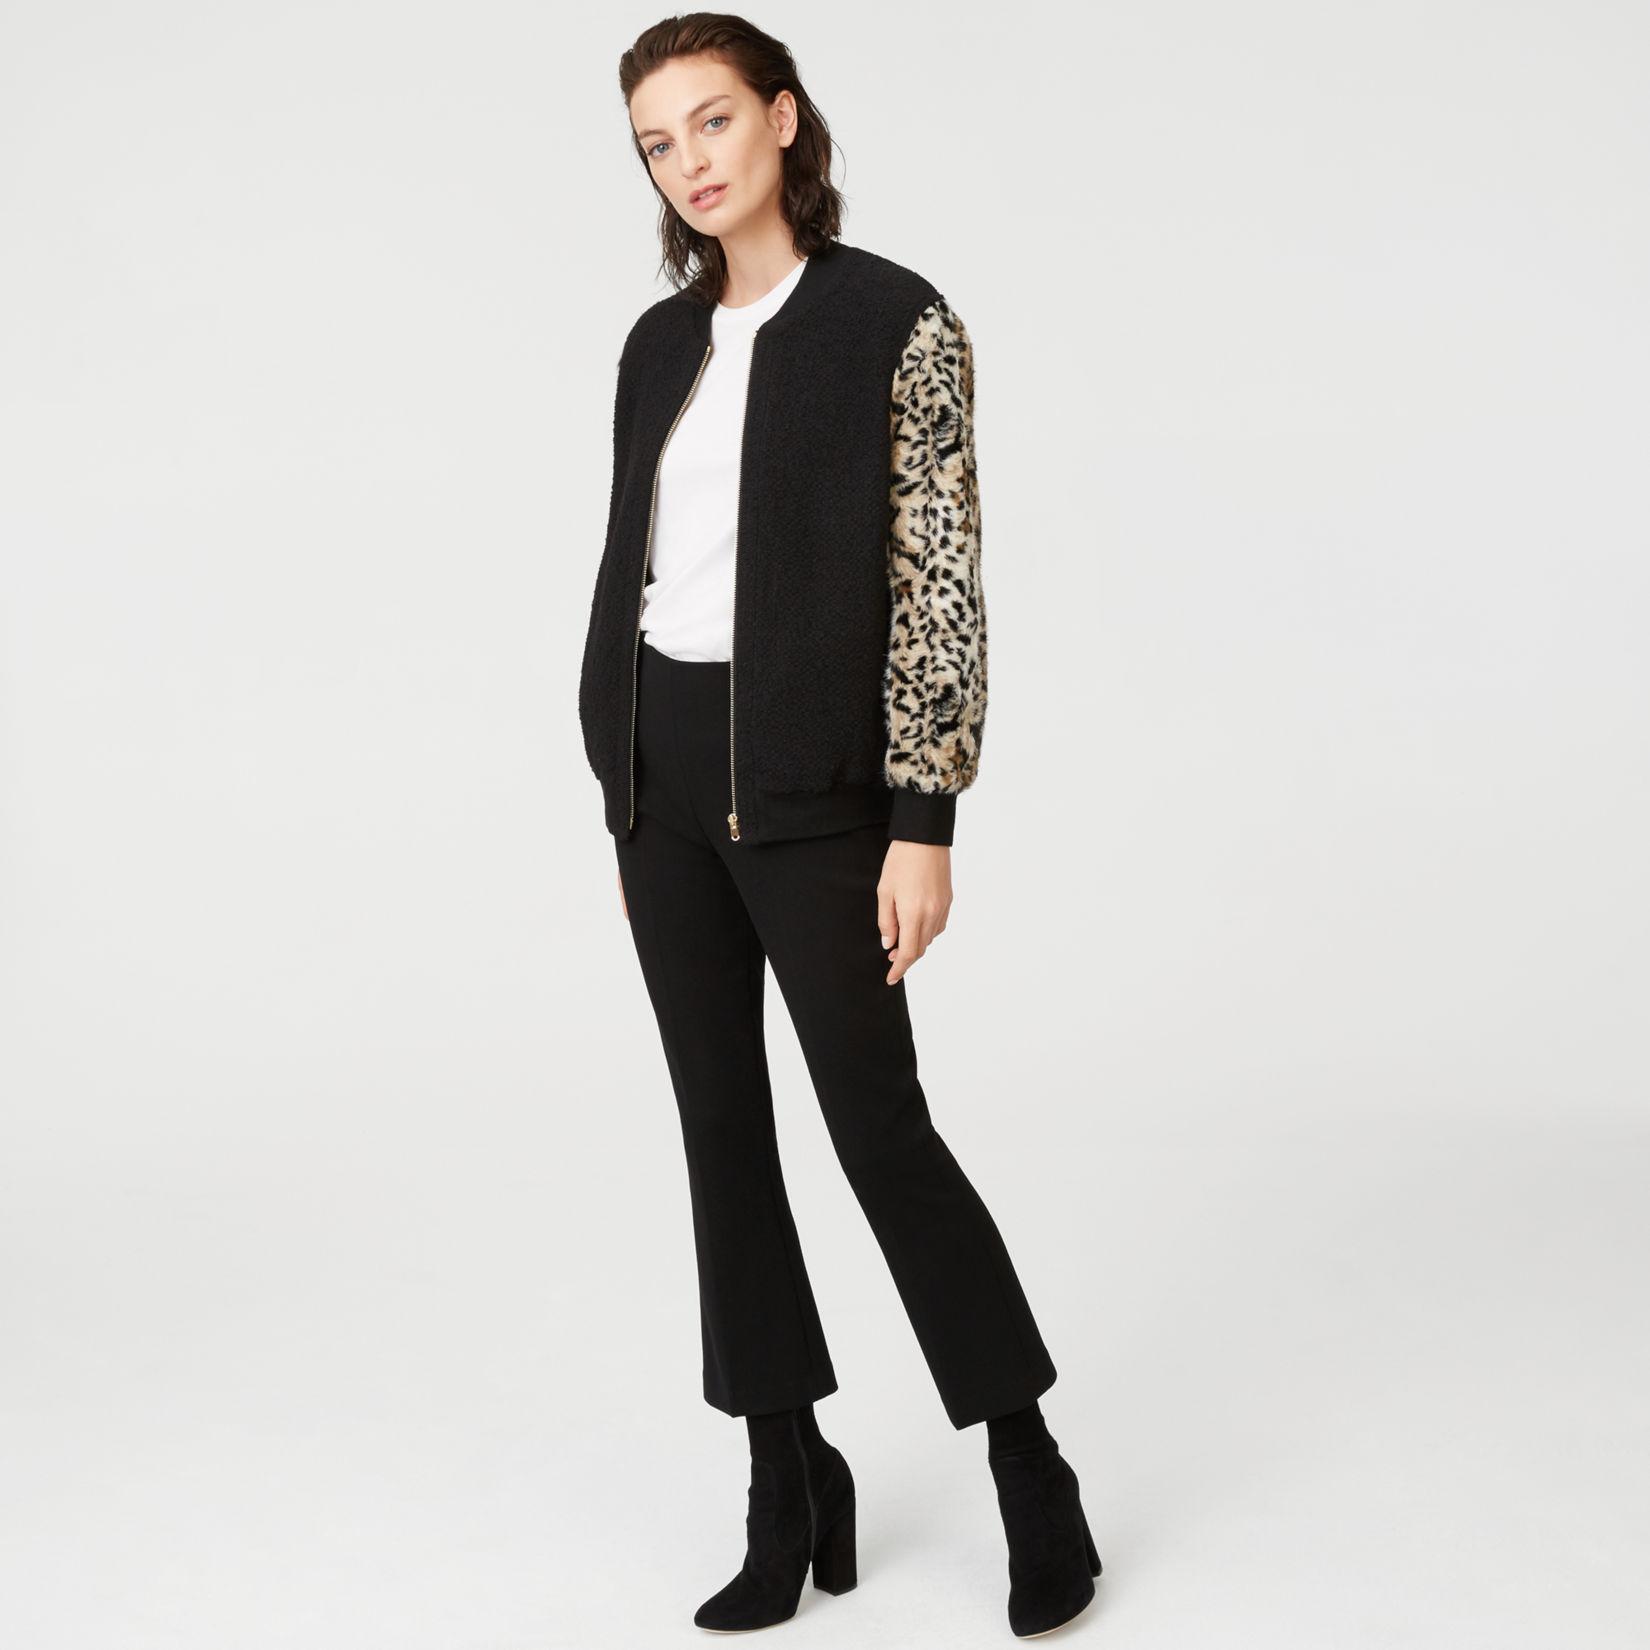 Women | Blazers, Jackets and Vests | Club Monaco